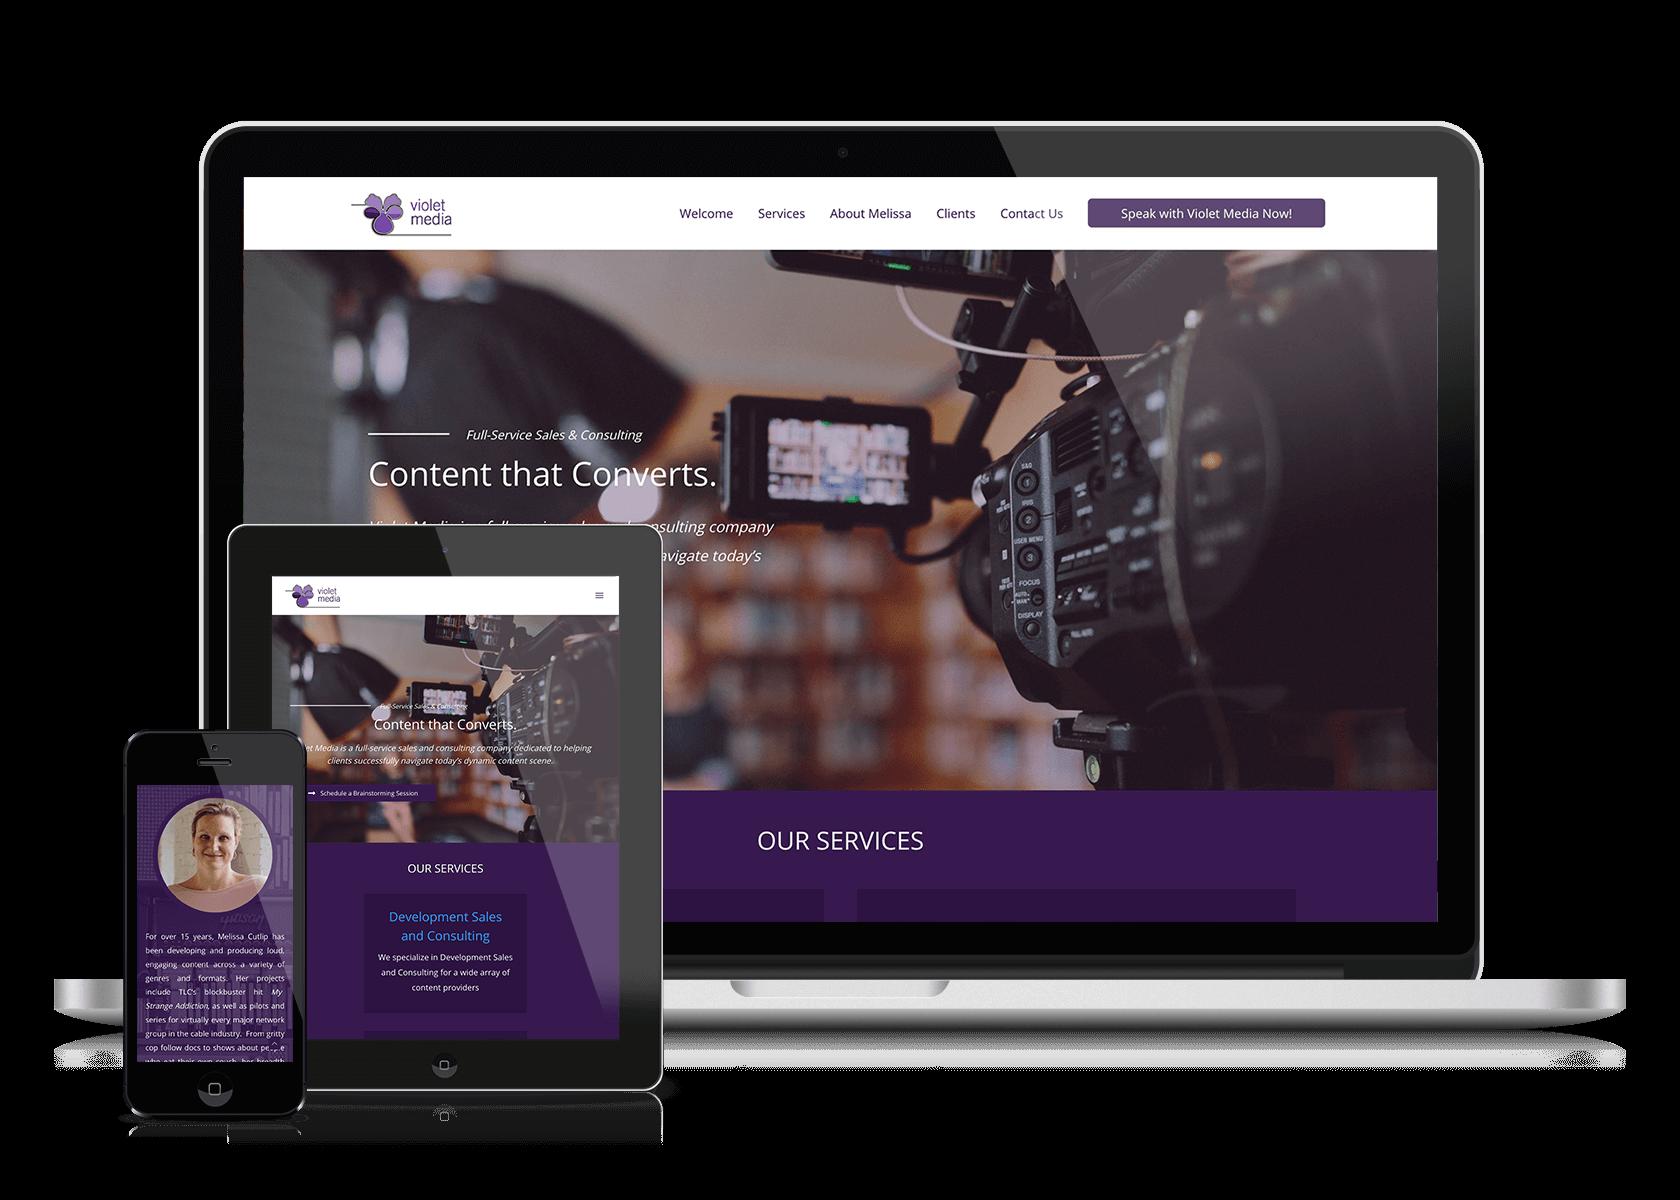 Violet Media